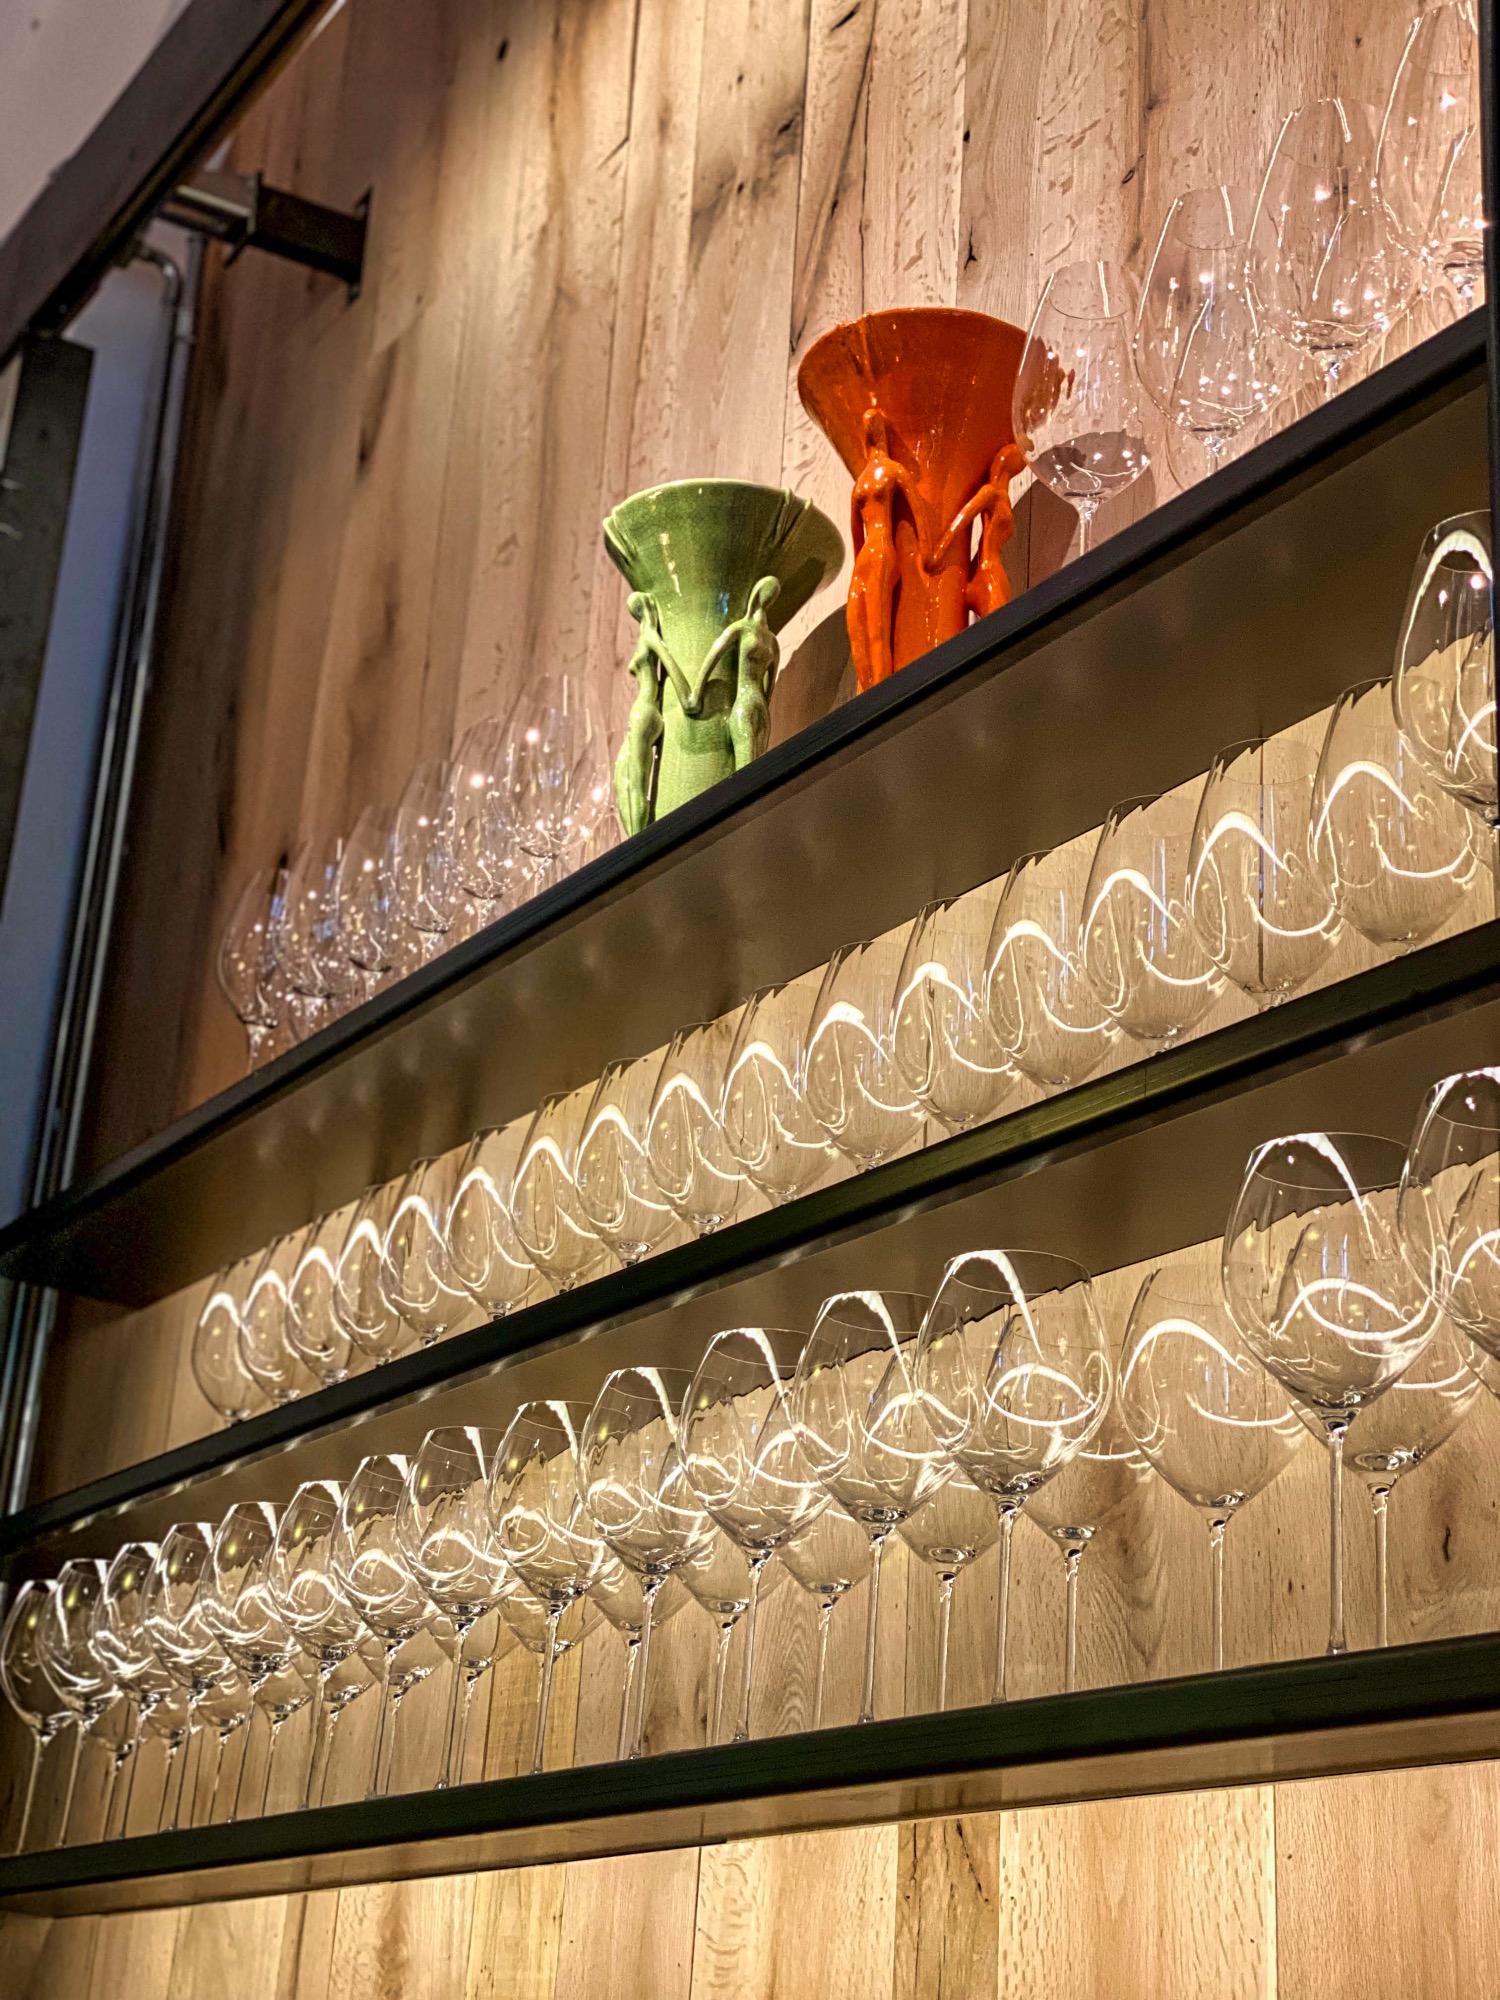 img_5849_salt_budapest_restaurant_jokuti_vilagevo.jpeg